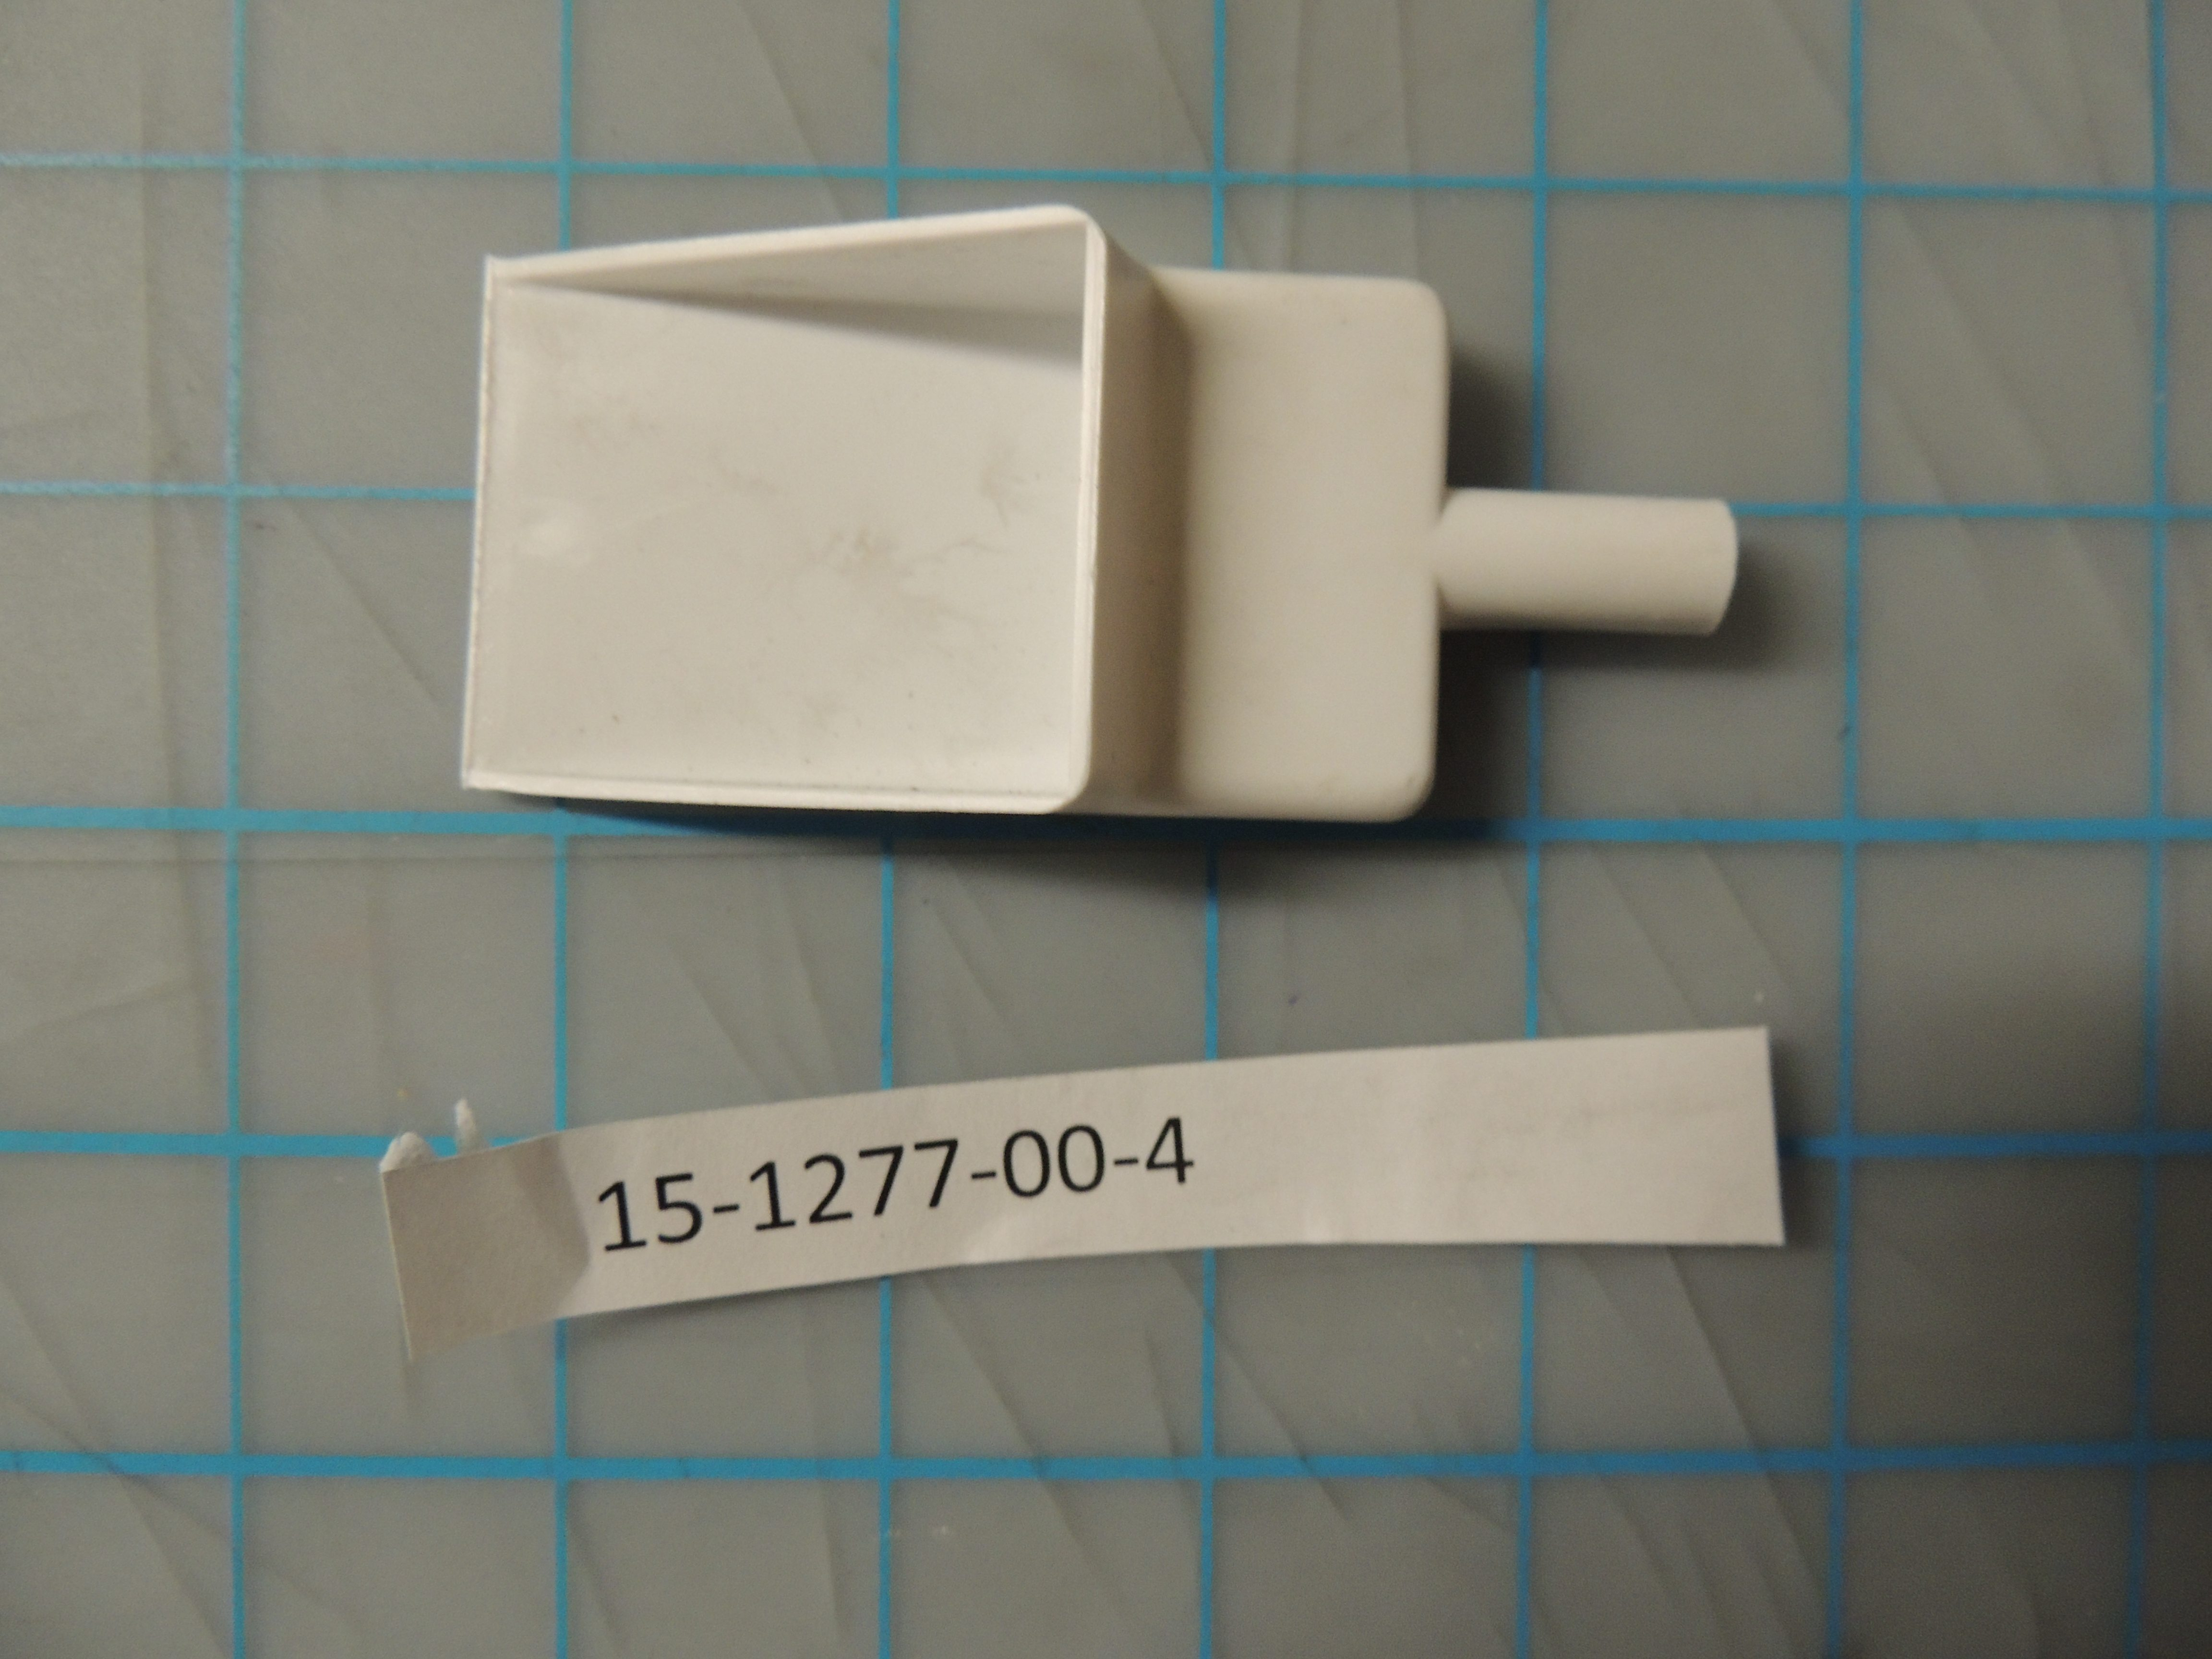 DPR2260 DRAIN SPOUT